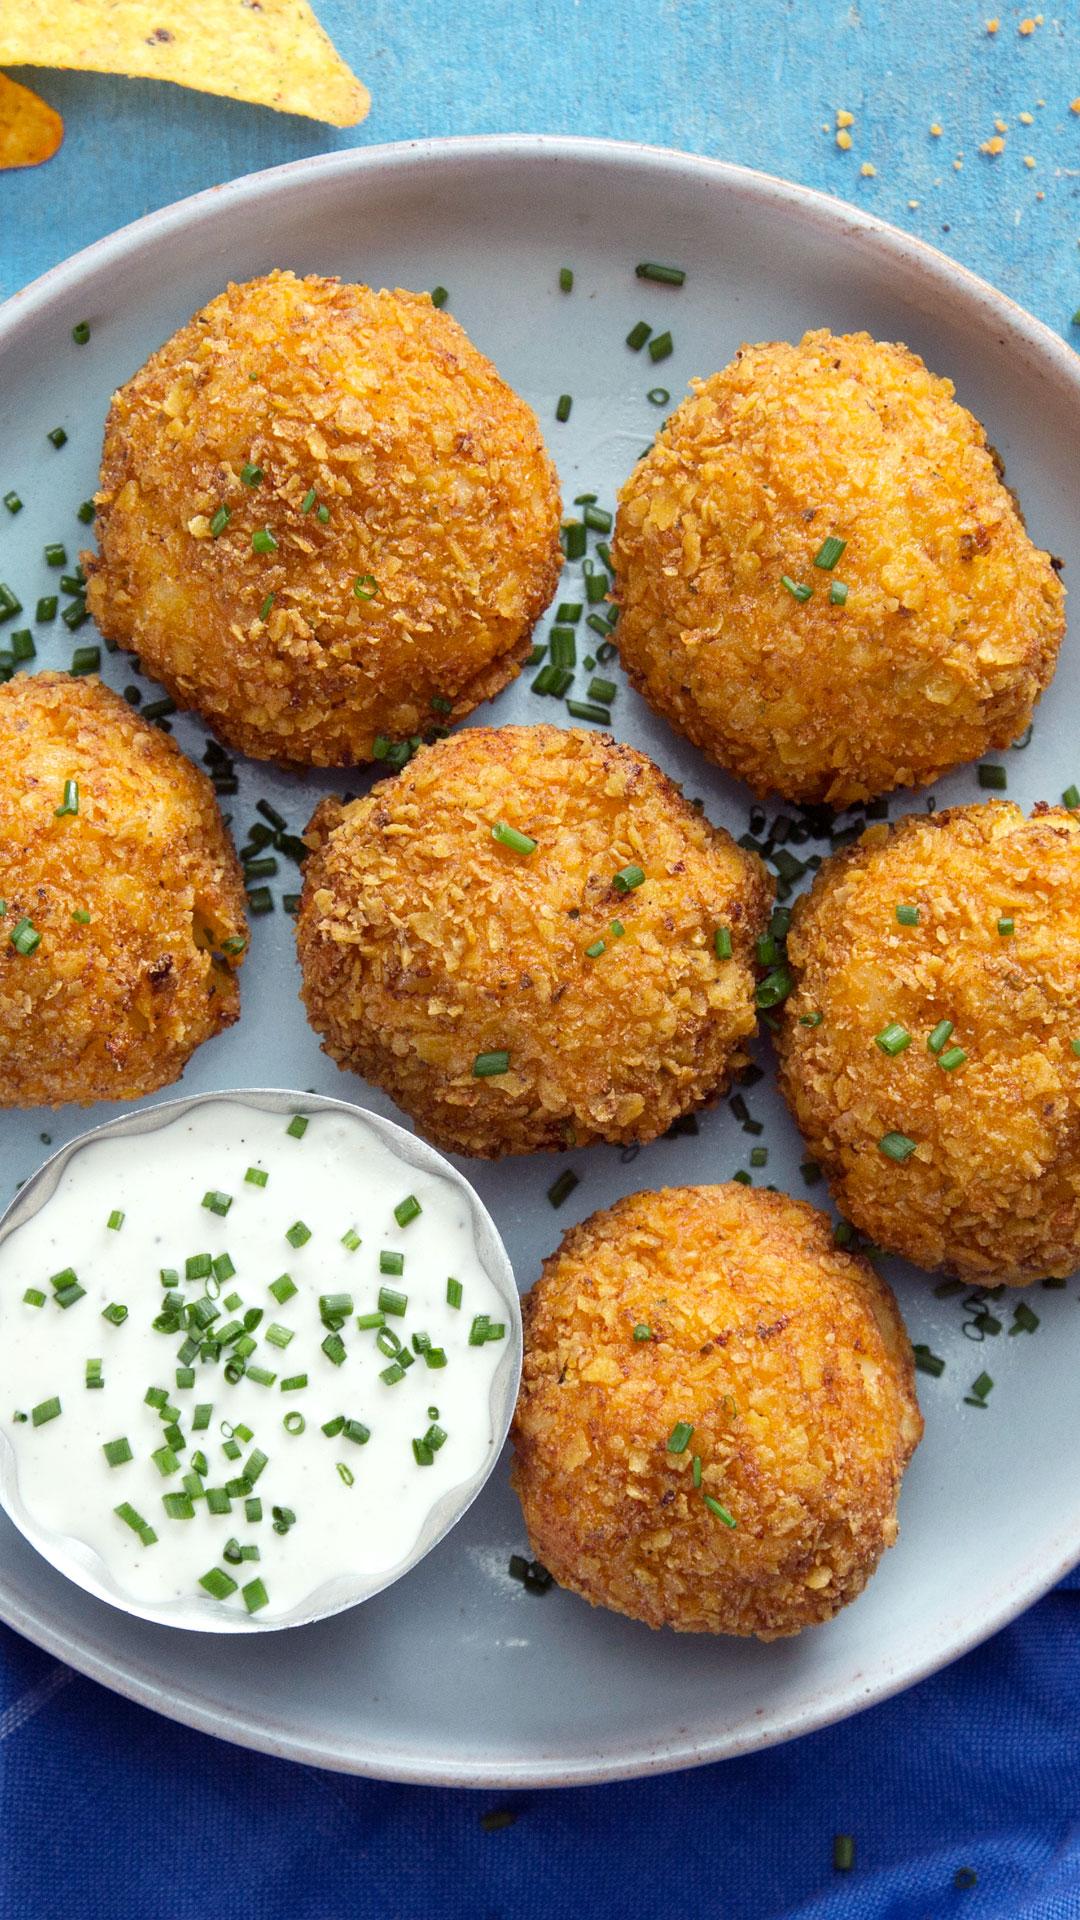 Cool and Cheesy Macaroni Balls